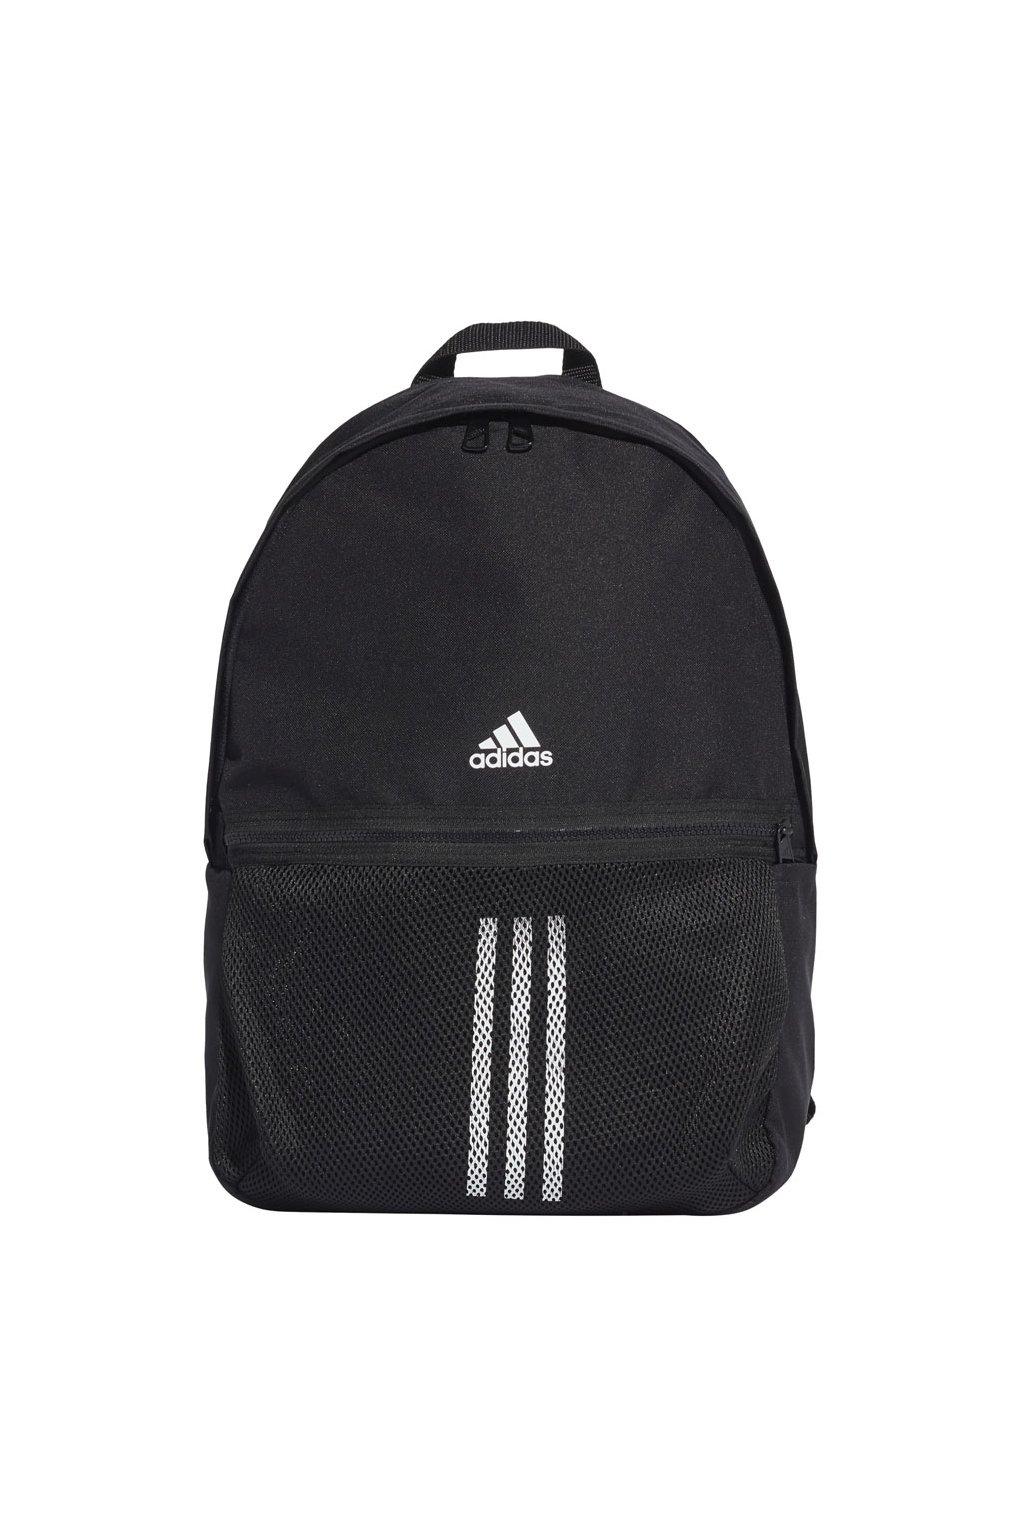 Batoh Adidas Classic 3S čierny FS8331